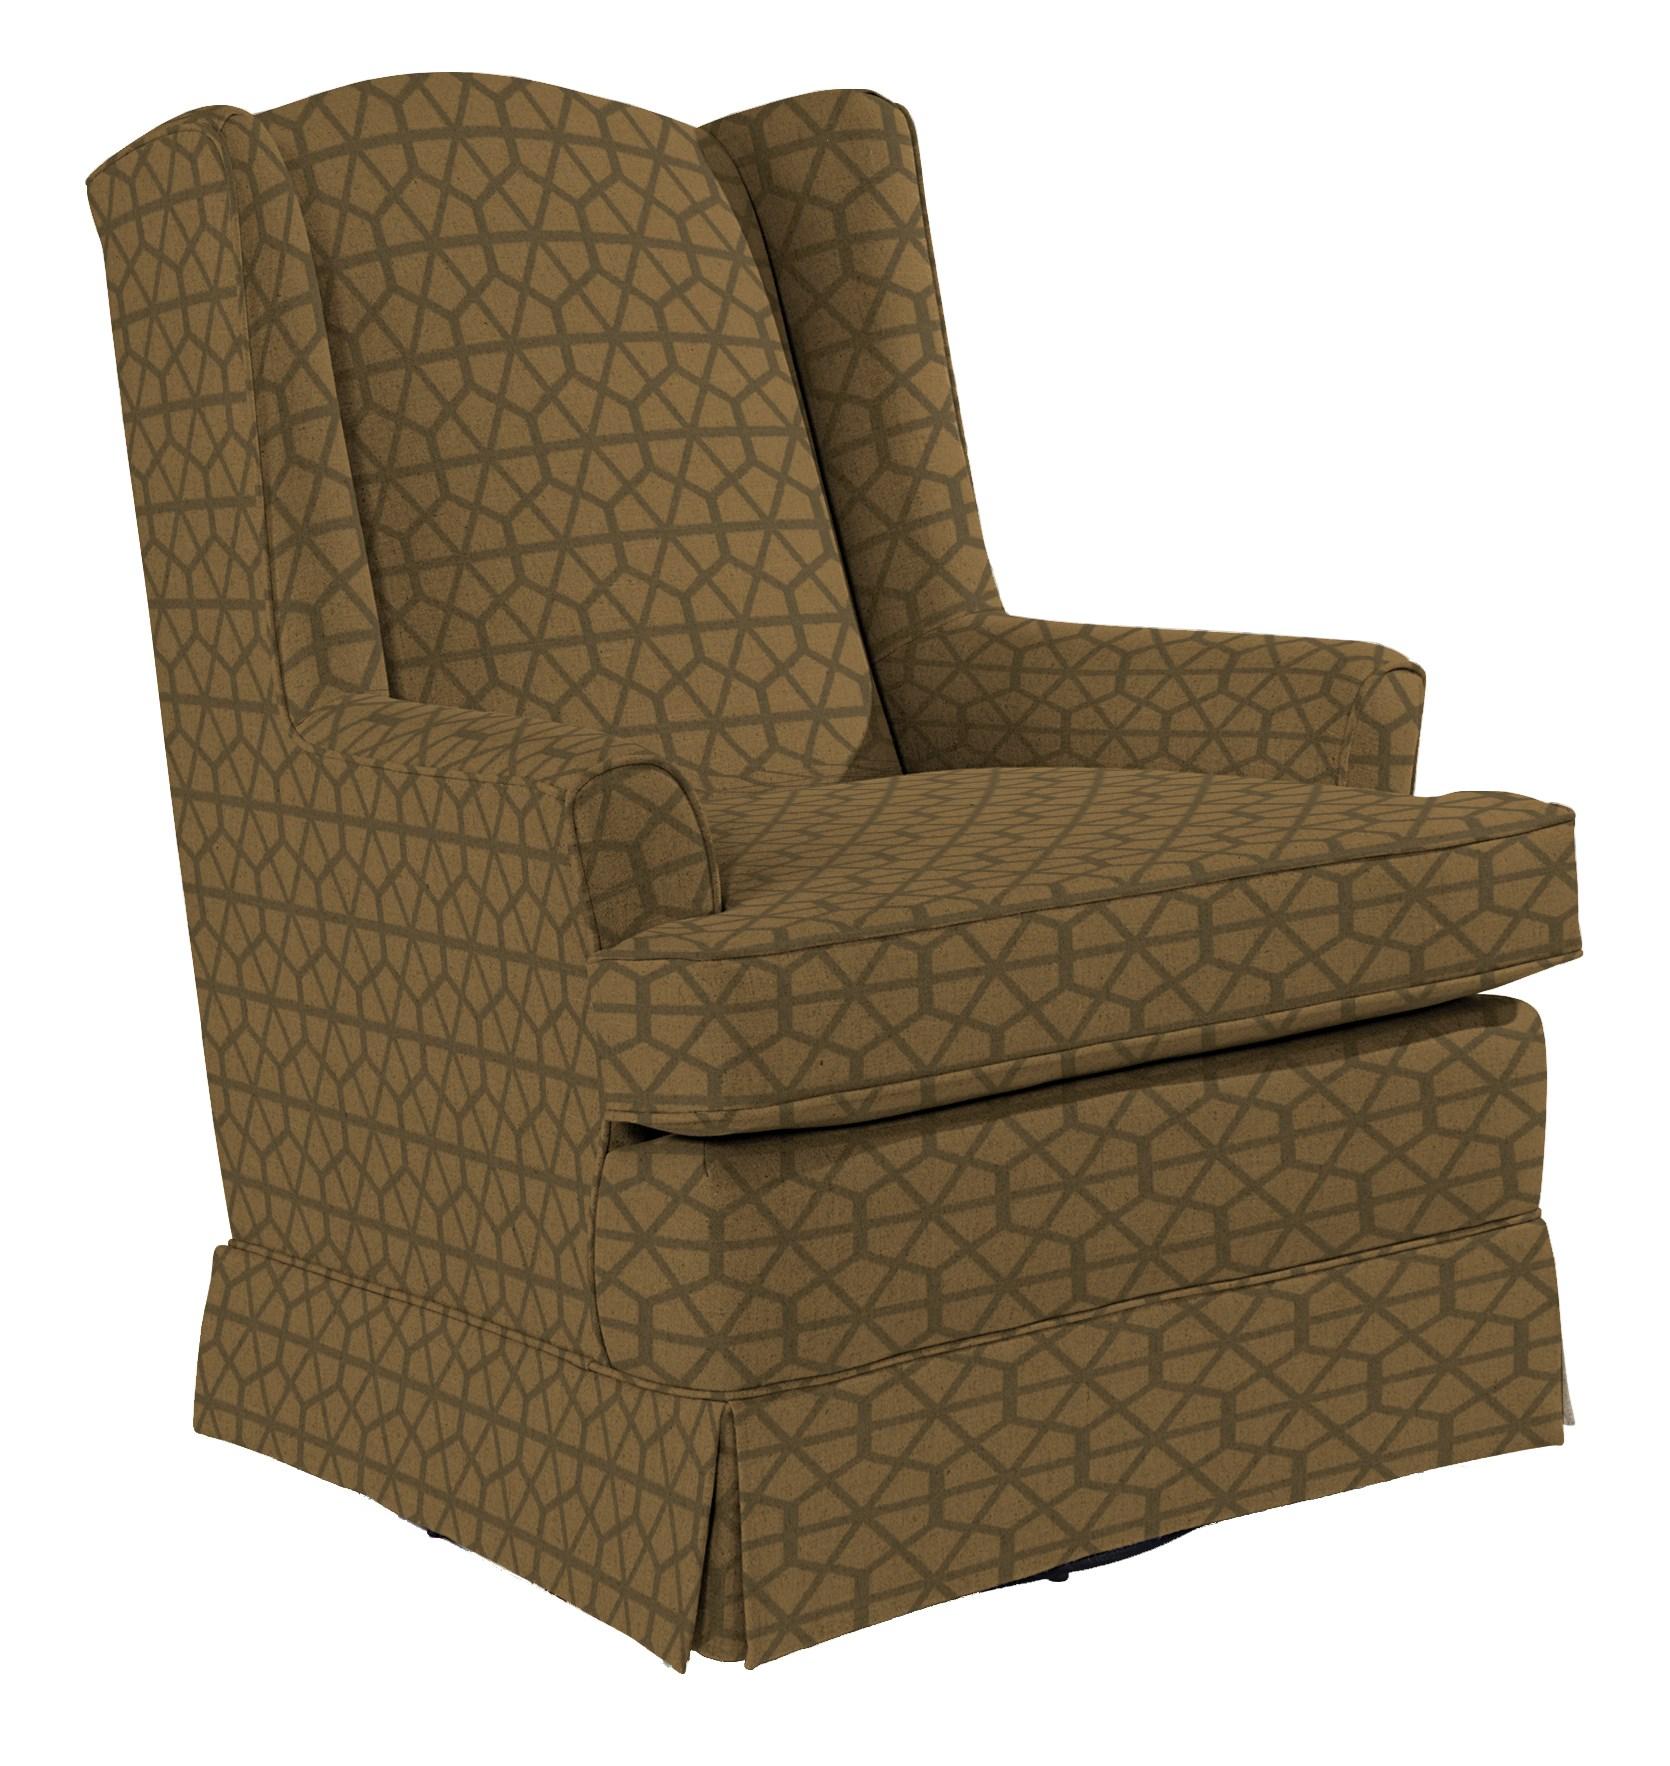 Best Home Furnishings Chairs - Swivel Glide Natasha Swivel Glider - Item Number: 7147-29099